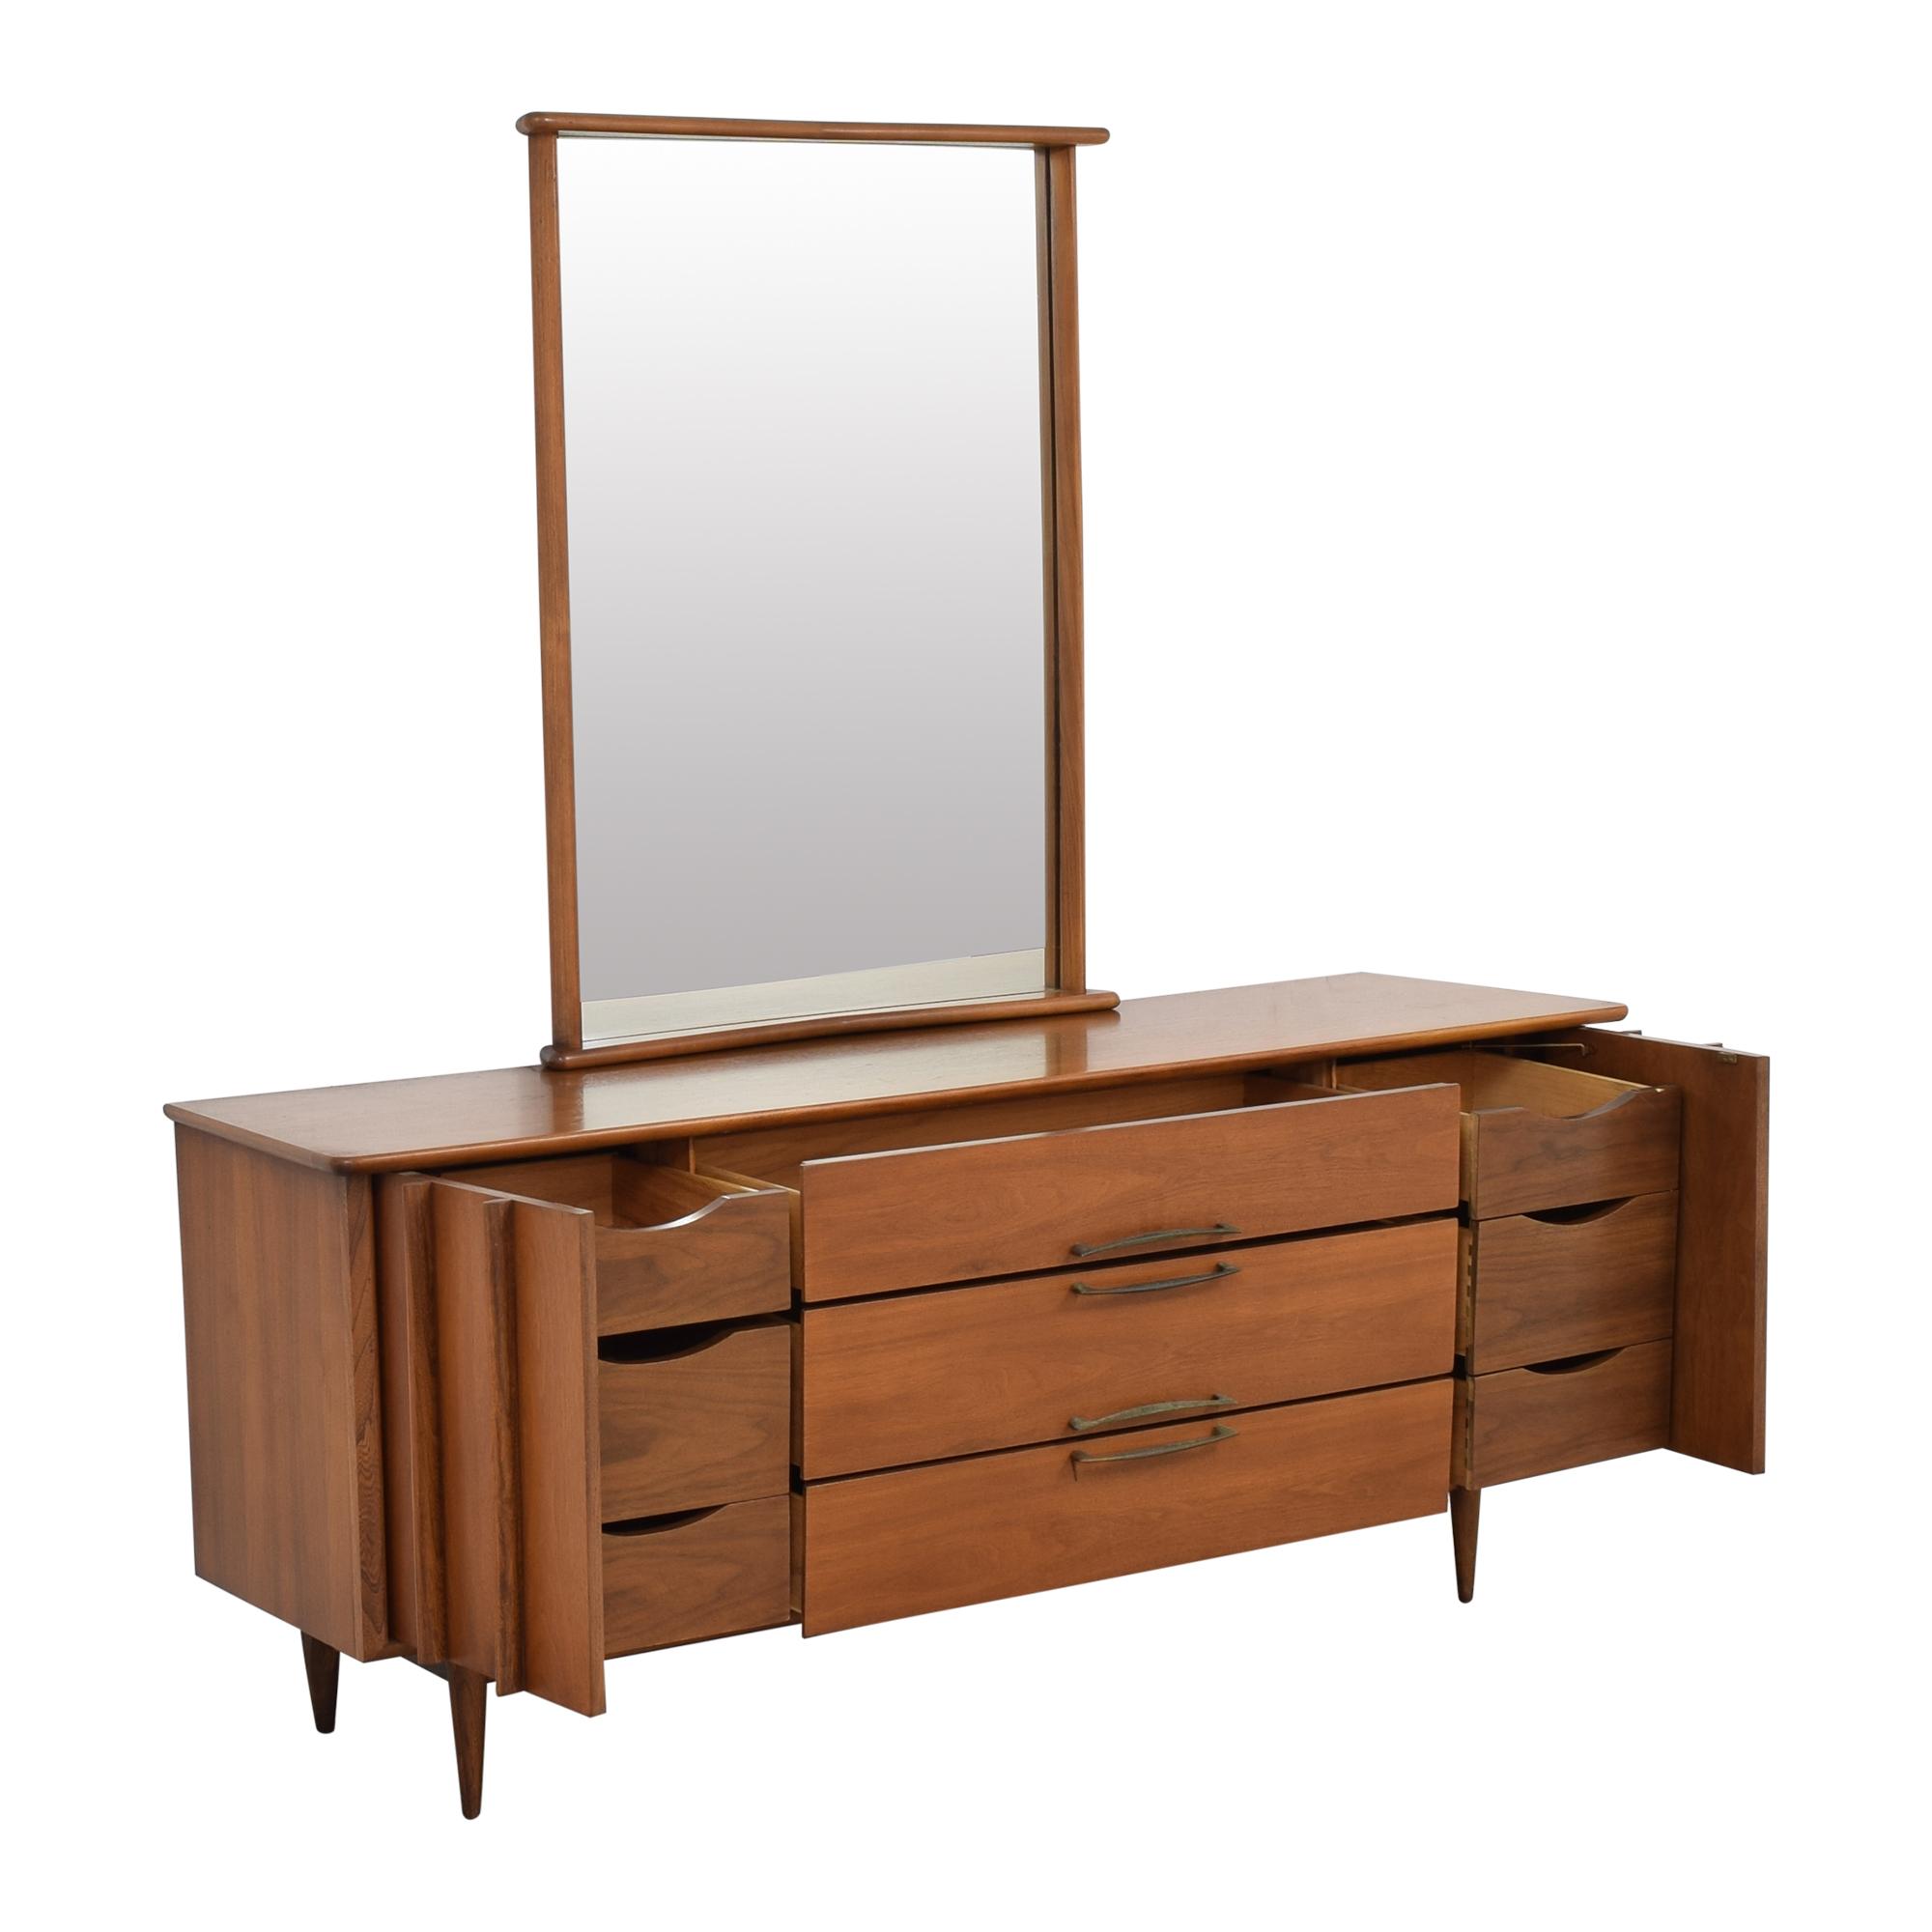 Kent Coffey Kent Coffey The Eloquence Dresser with Mirror discount